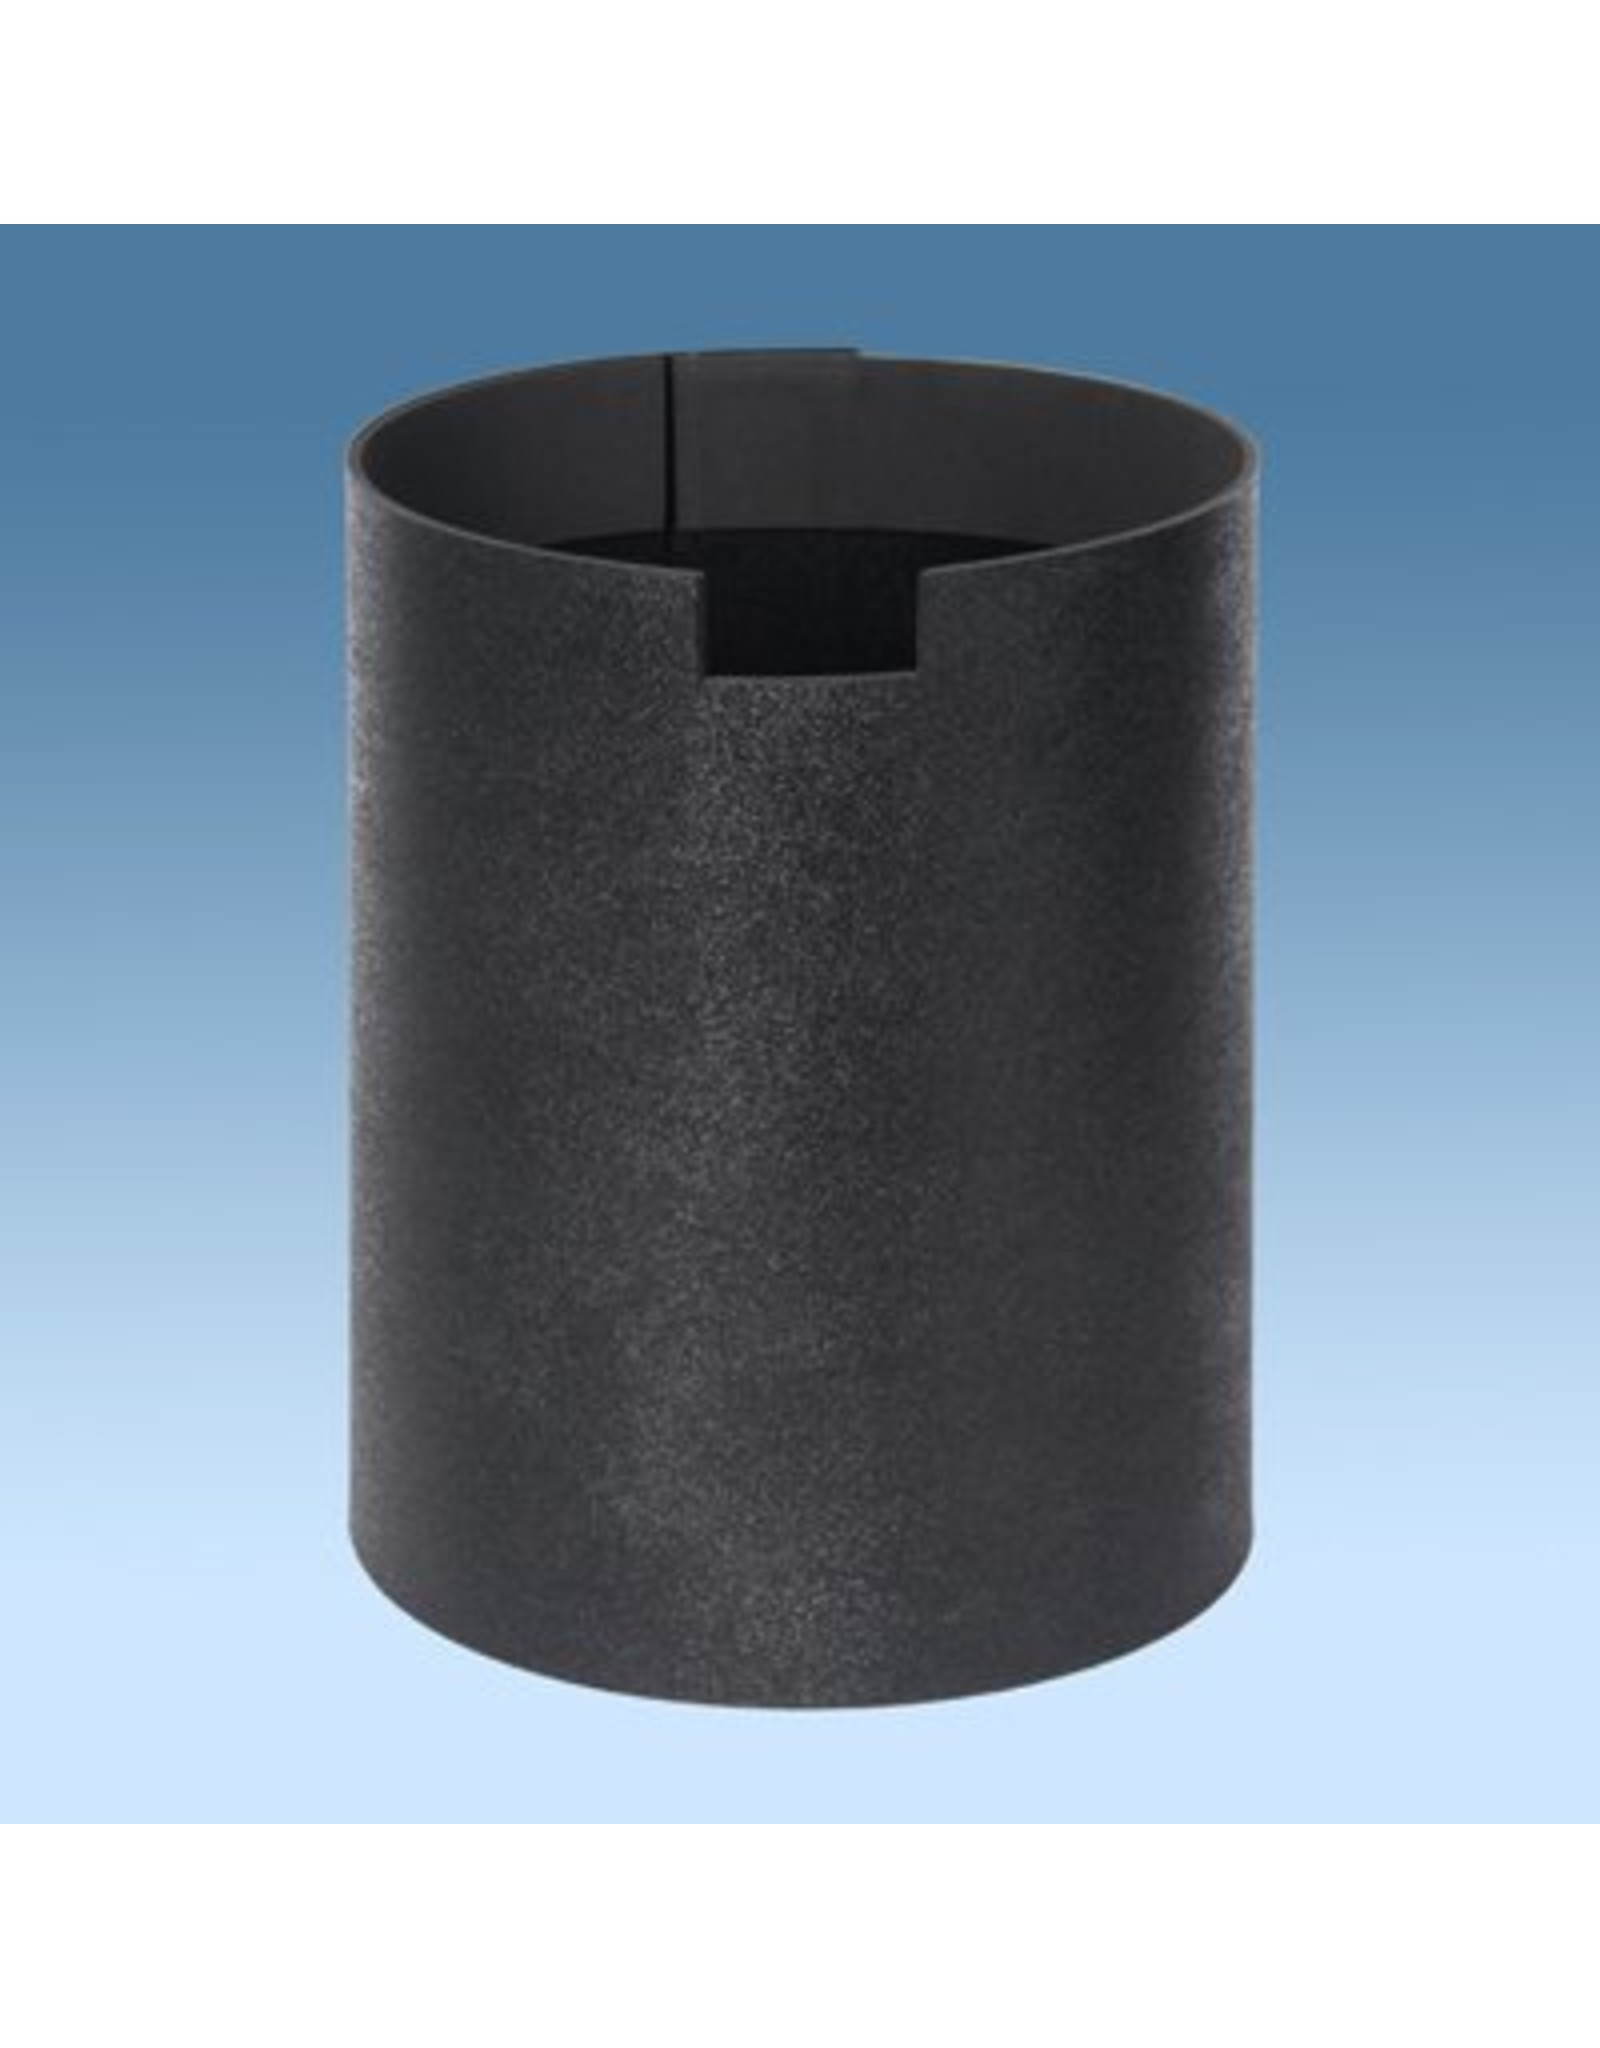 Astrozap Celestron NexStar 4/4SE and 102 SLT Flexi-Shield™ Flexible Dew Shield - with No Notches